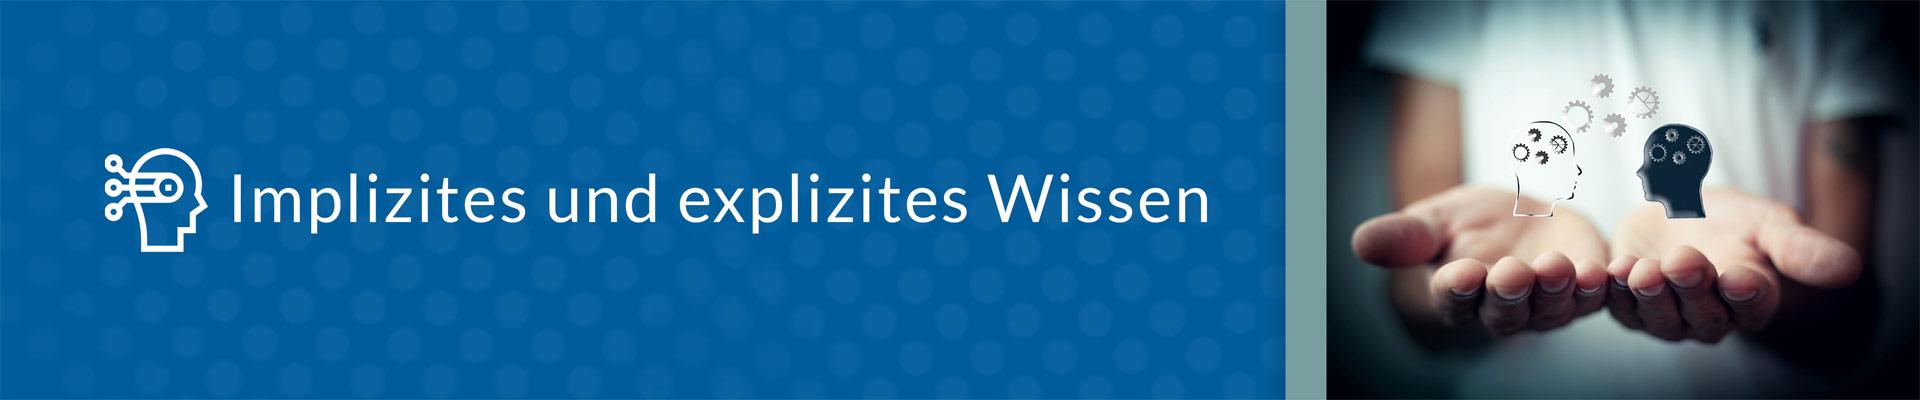 innolytics-implizites-und-explizites-wissen-